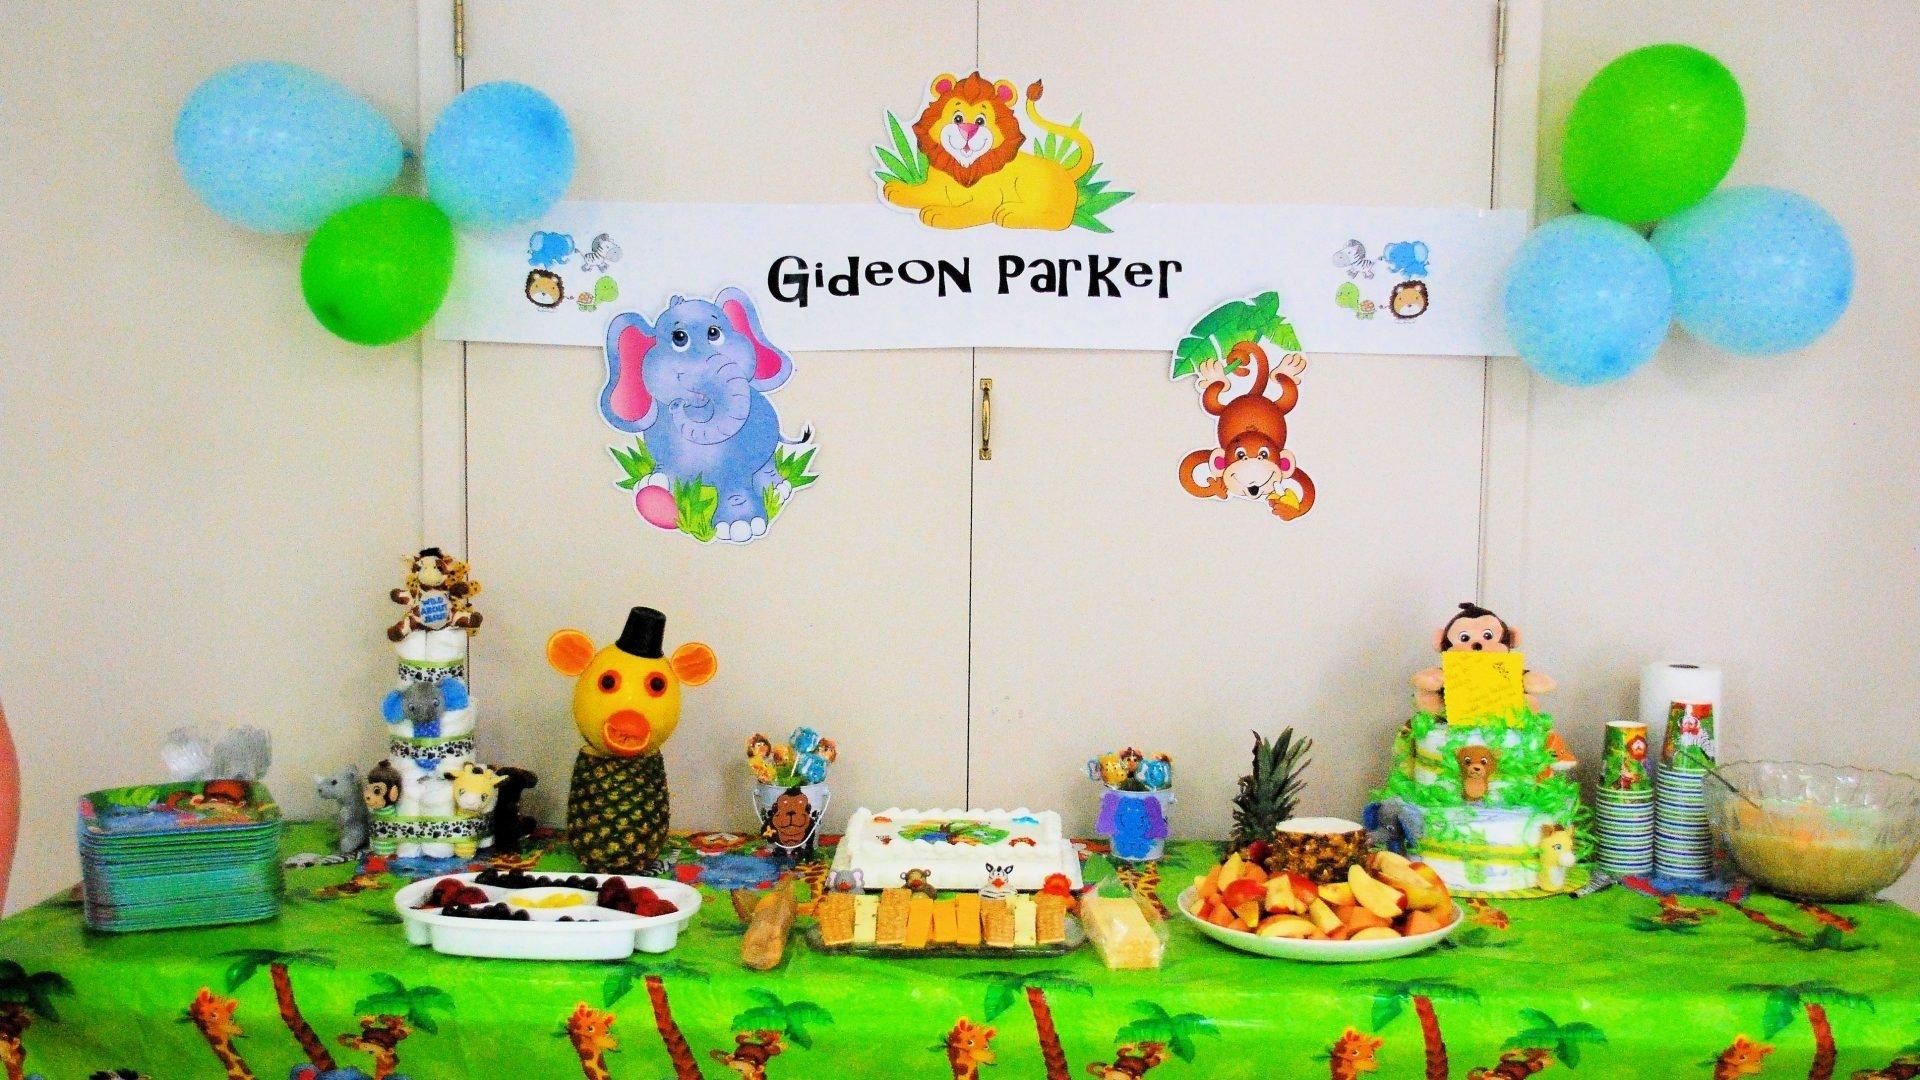 10 Great Jungle Safari Baby Shower Ideas jungle baby shower food ideas pinterest favors cake breathtaking